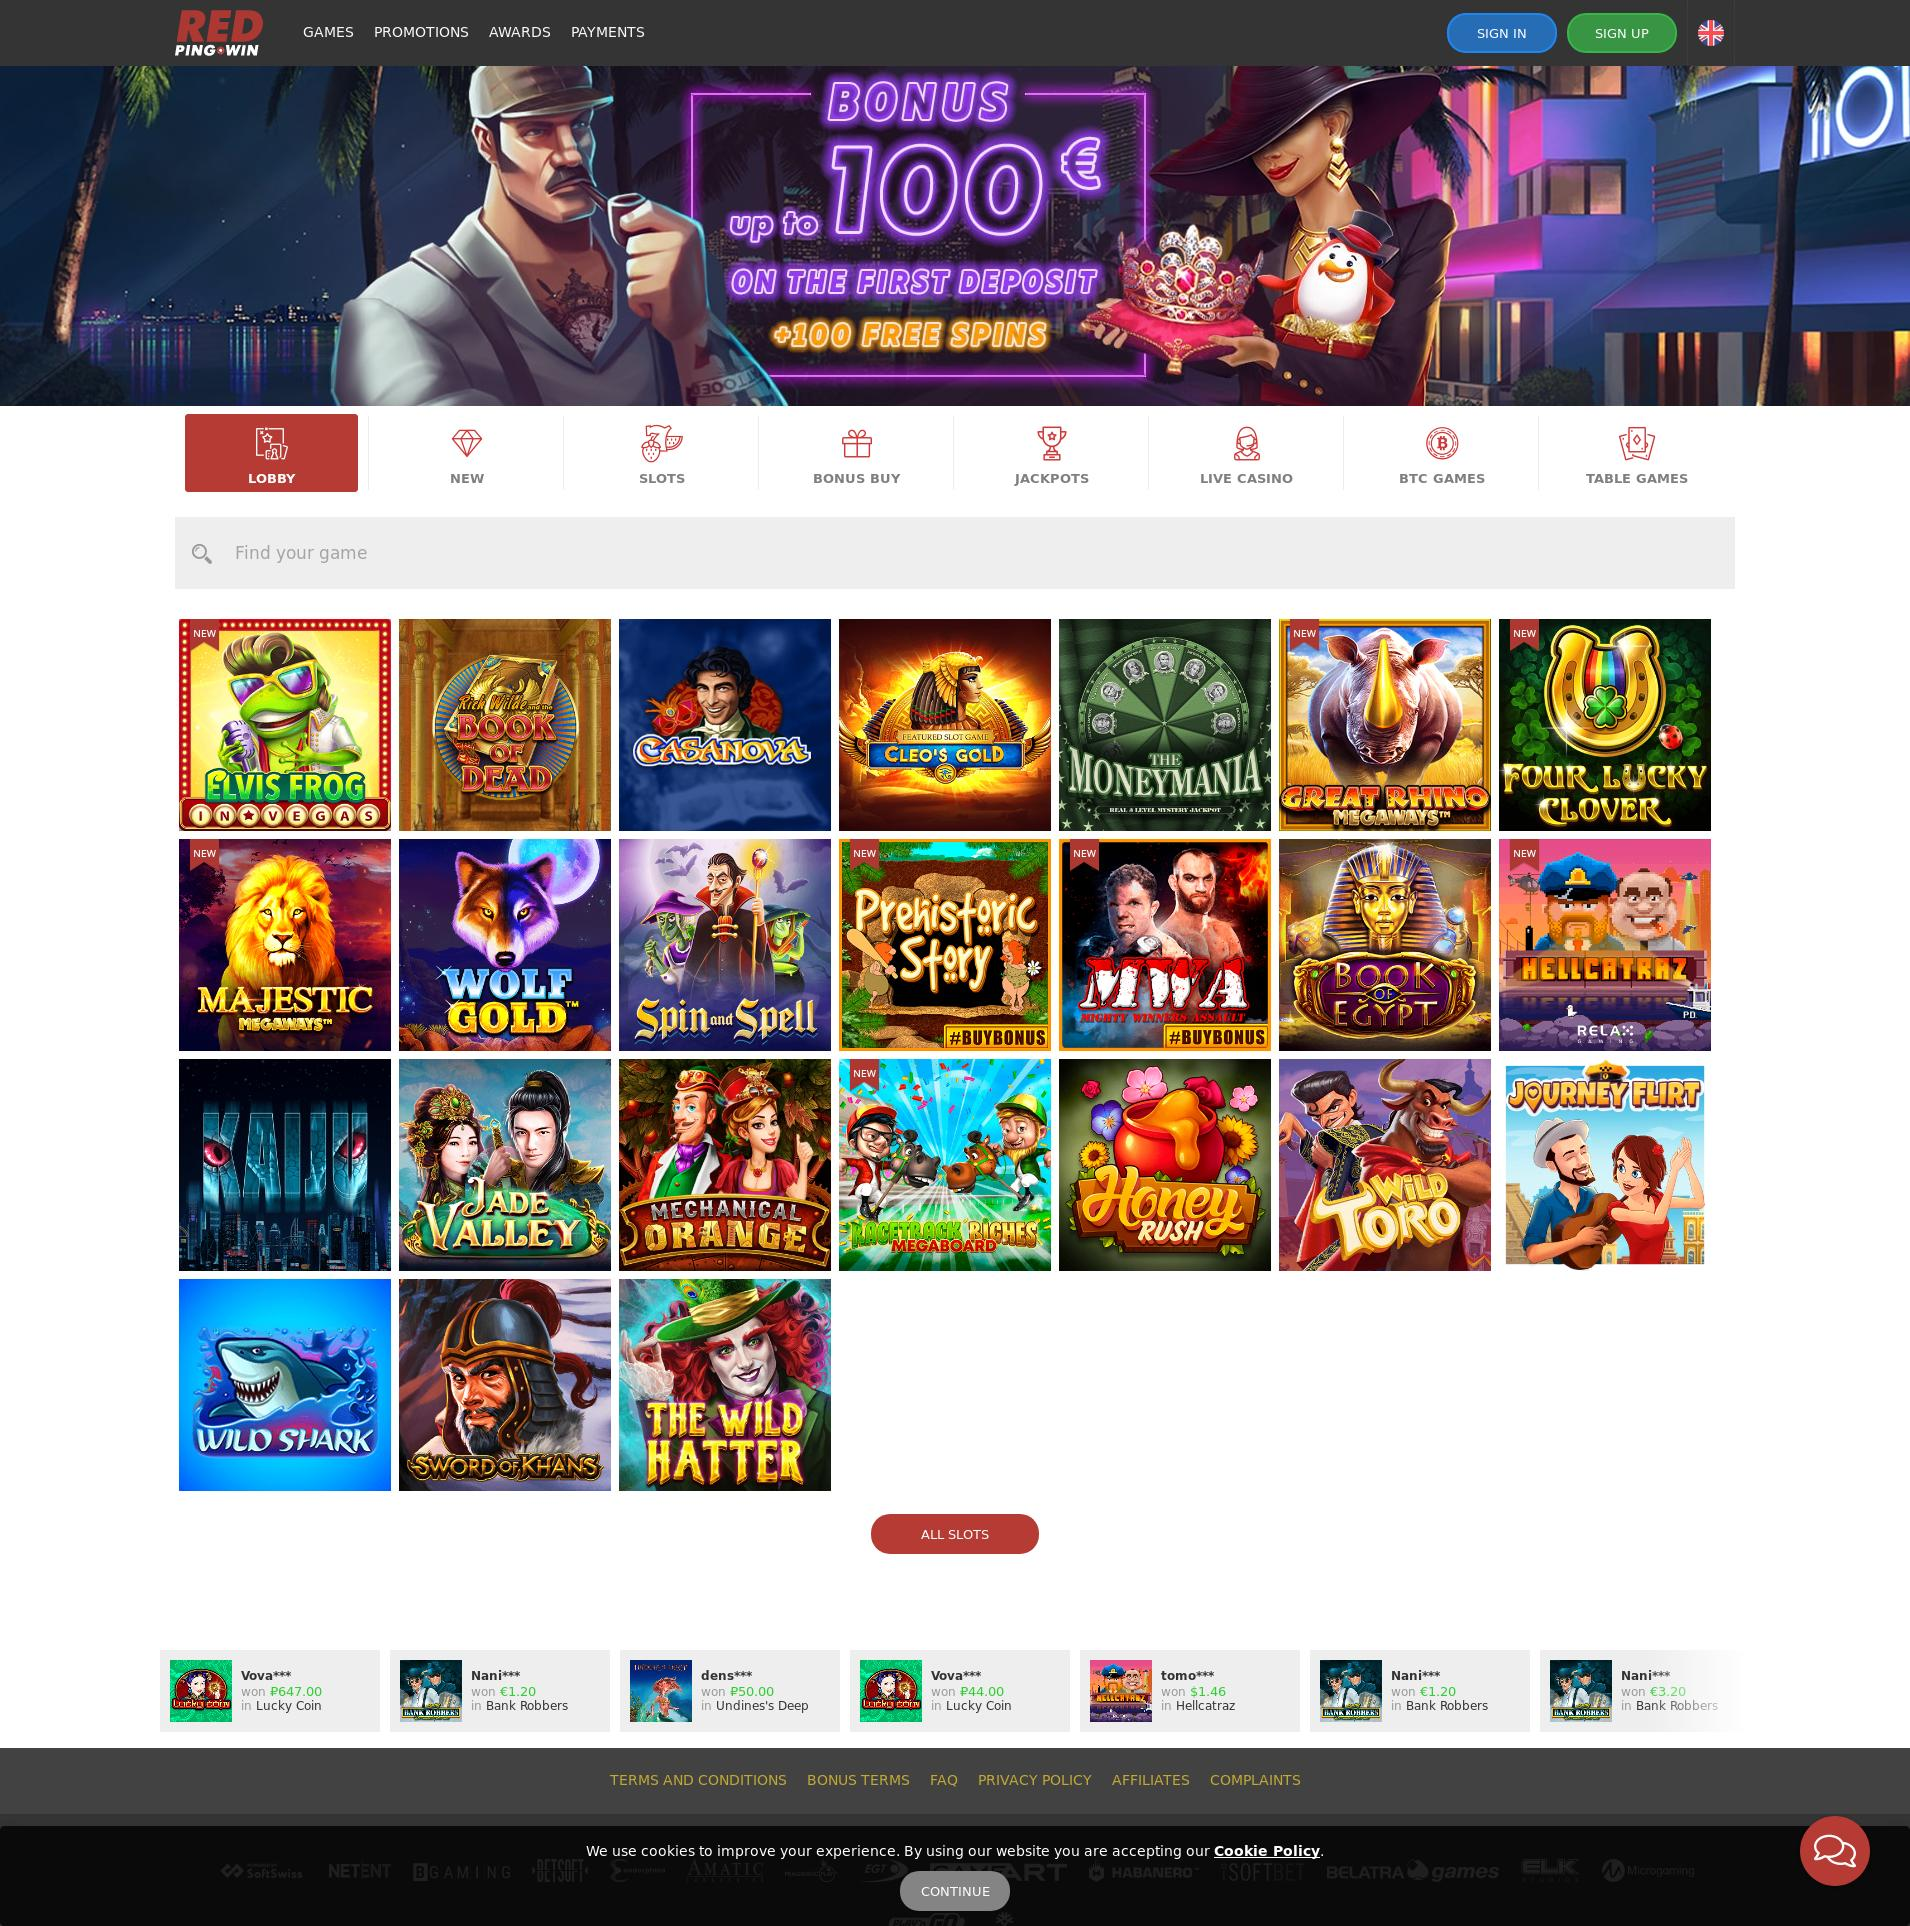 Casino skærm Lobby 2020-05-30 til Norge